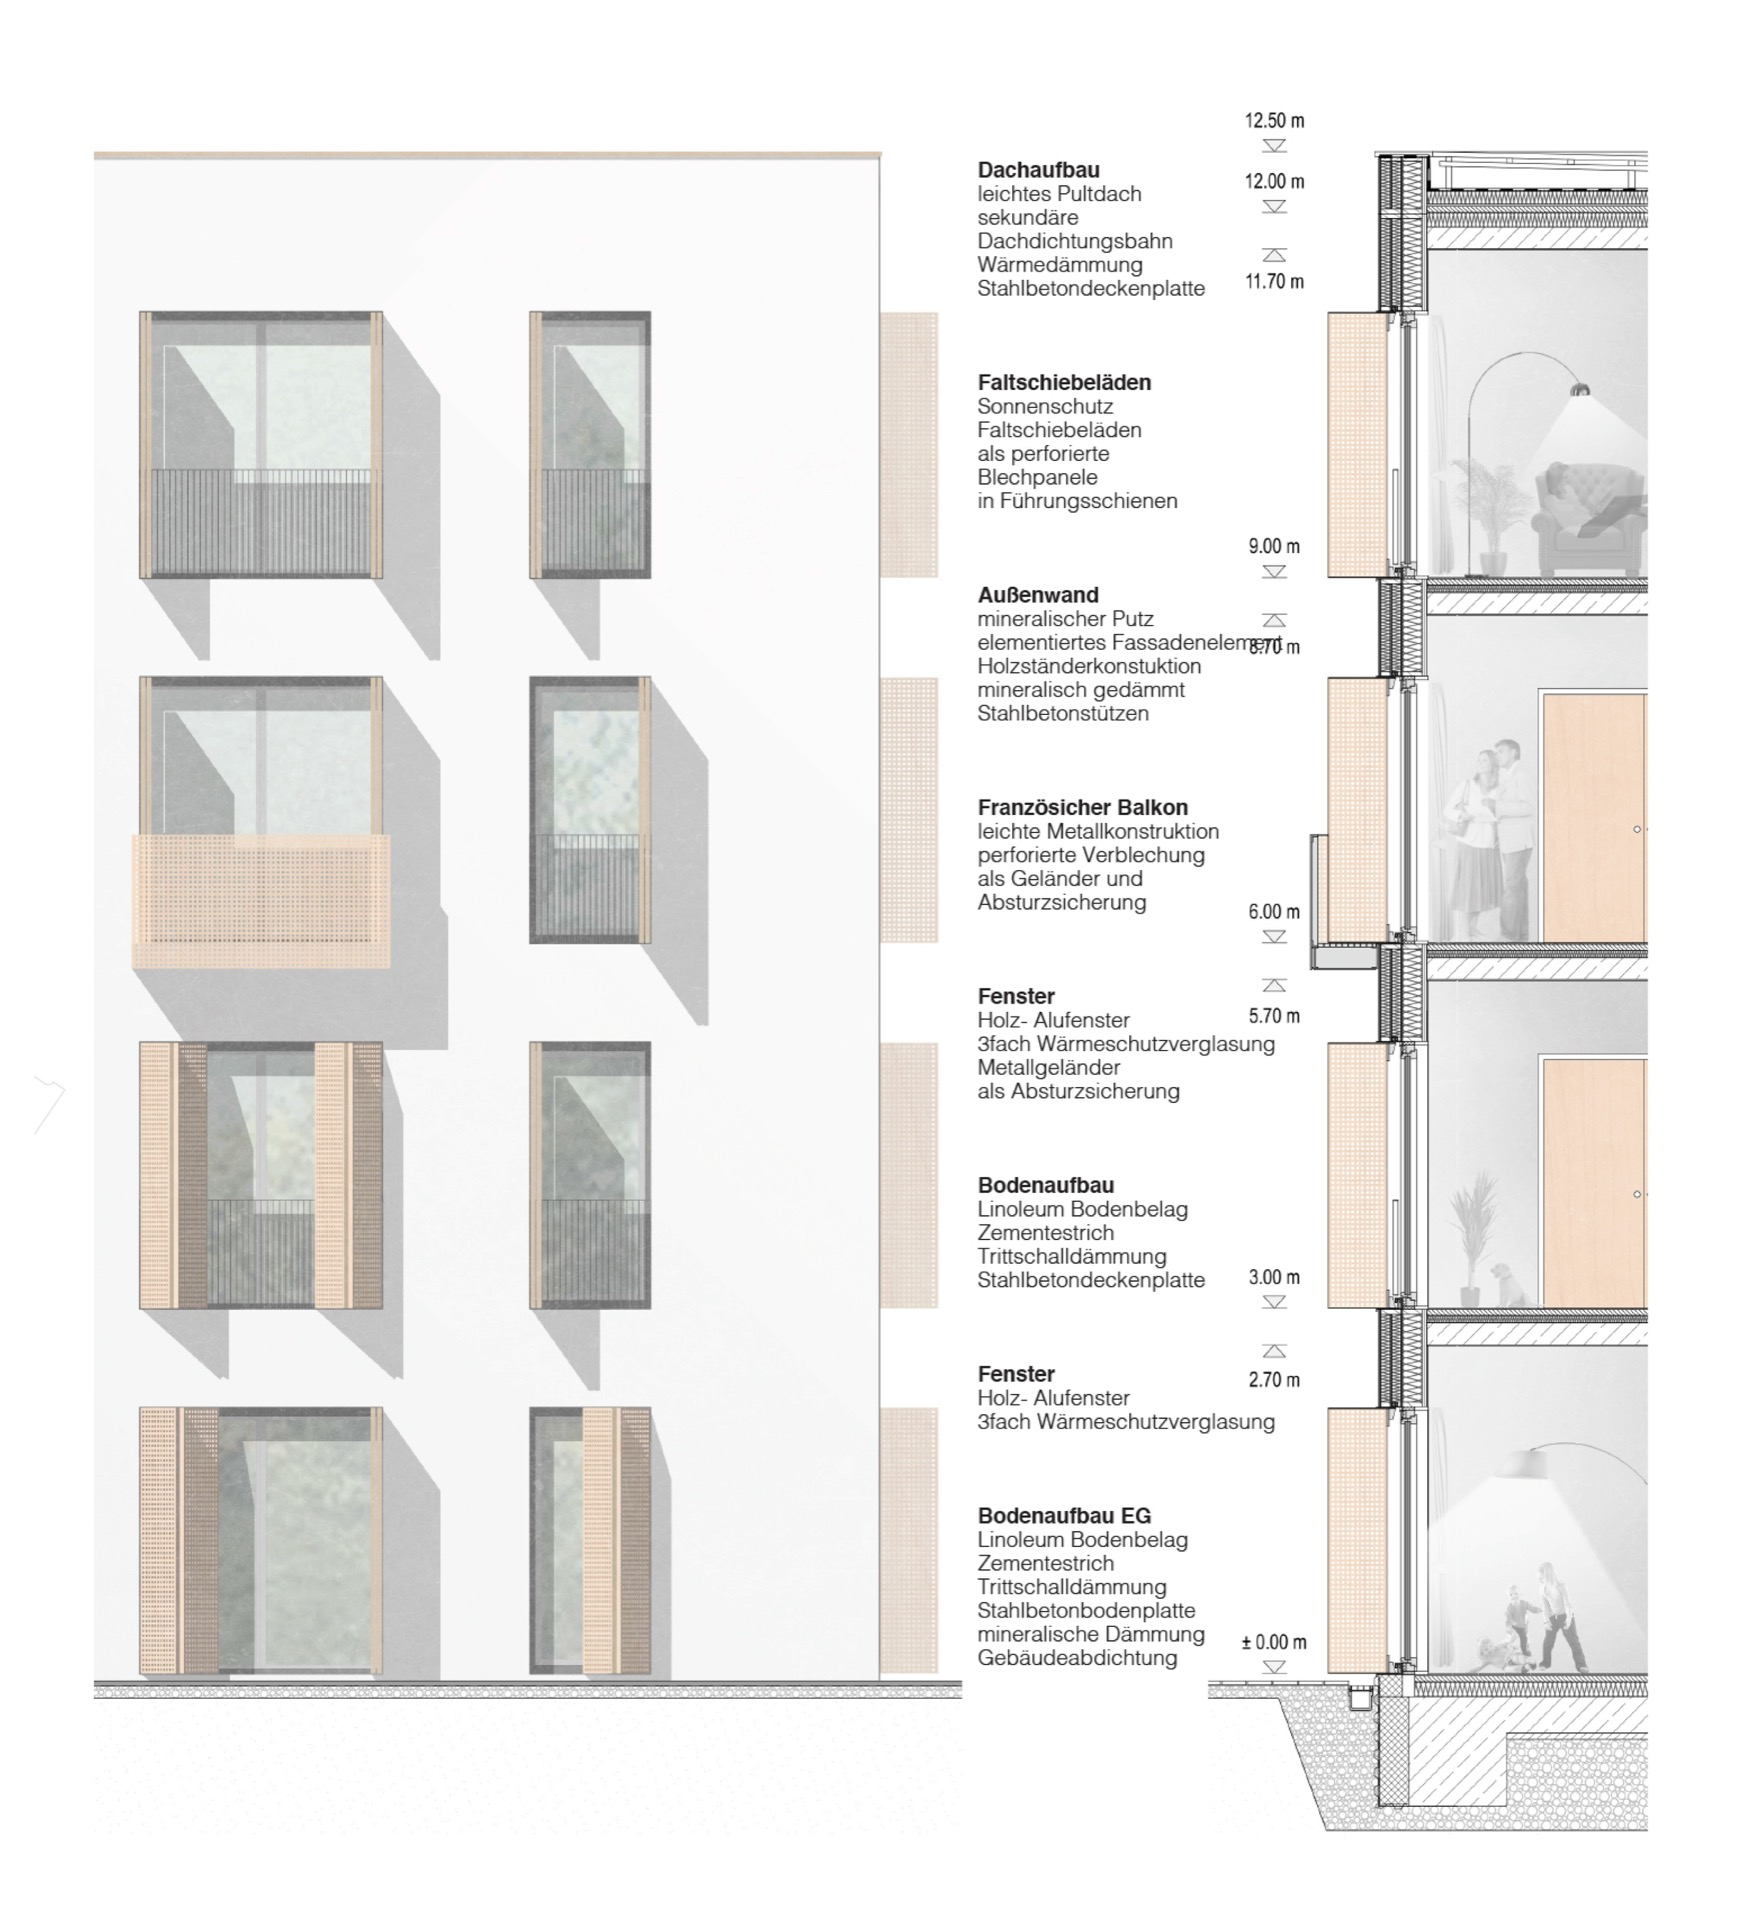 Fassadenschnitt © Architekten BDA Feldschnieders + Kister